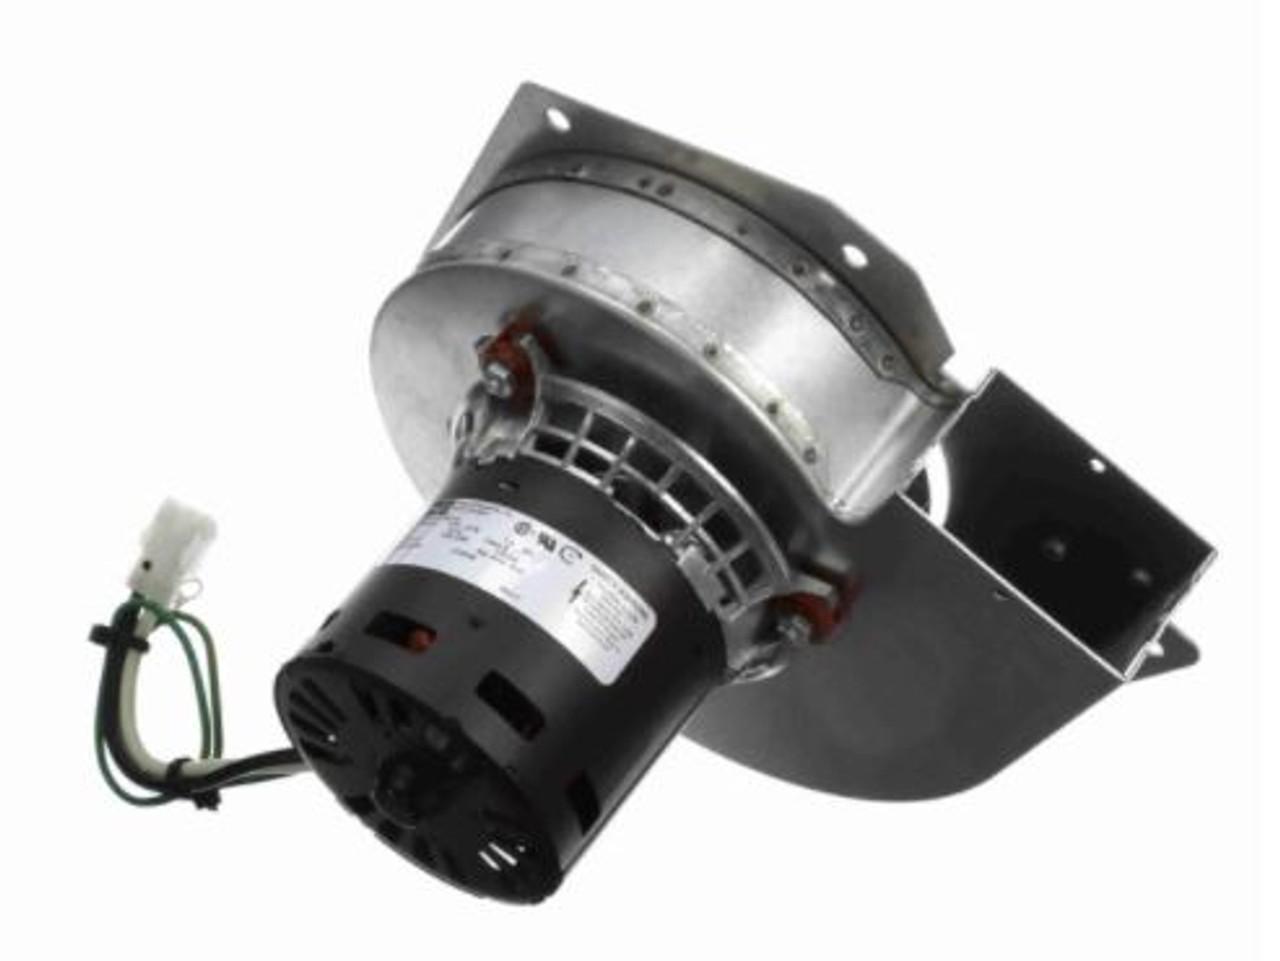 a143 fasco trane furnace draft inducer blower jakel j238 138 1344 115v